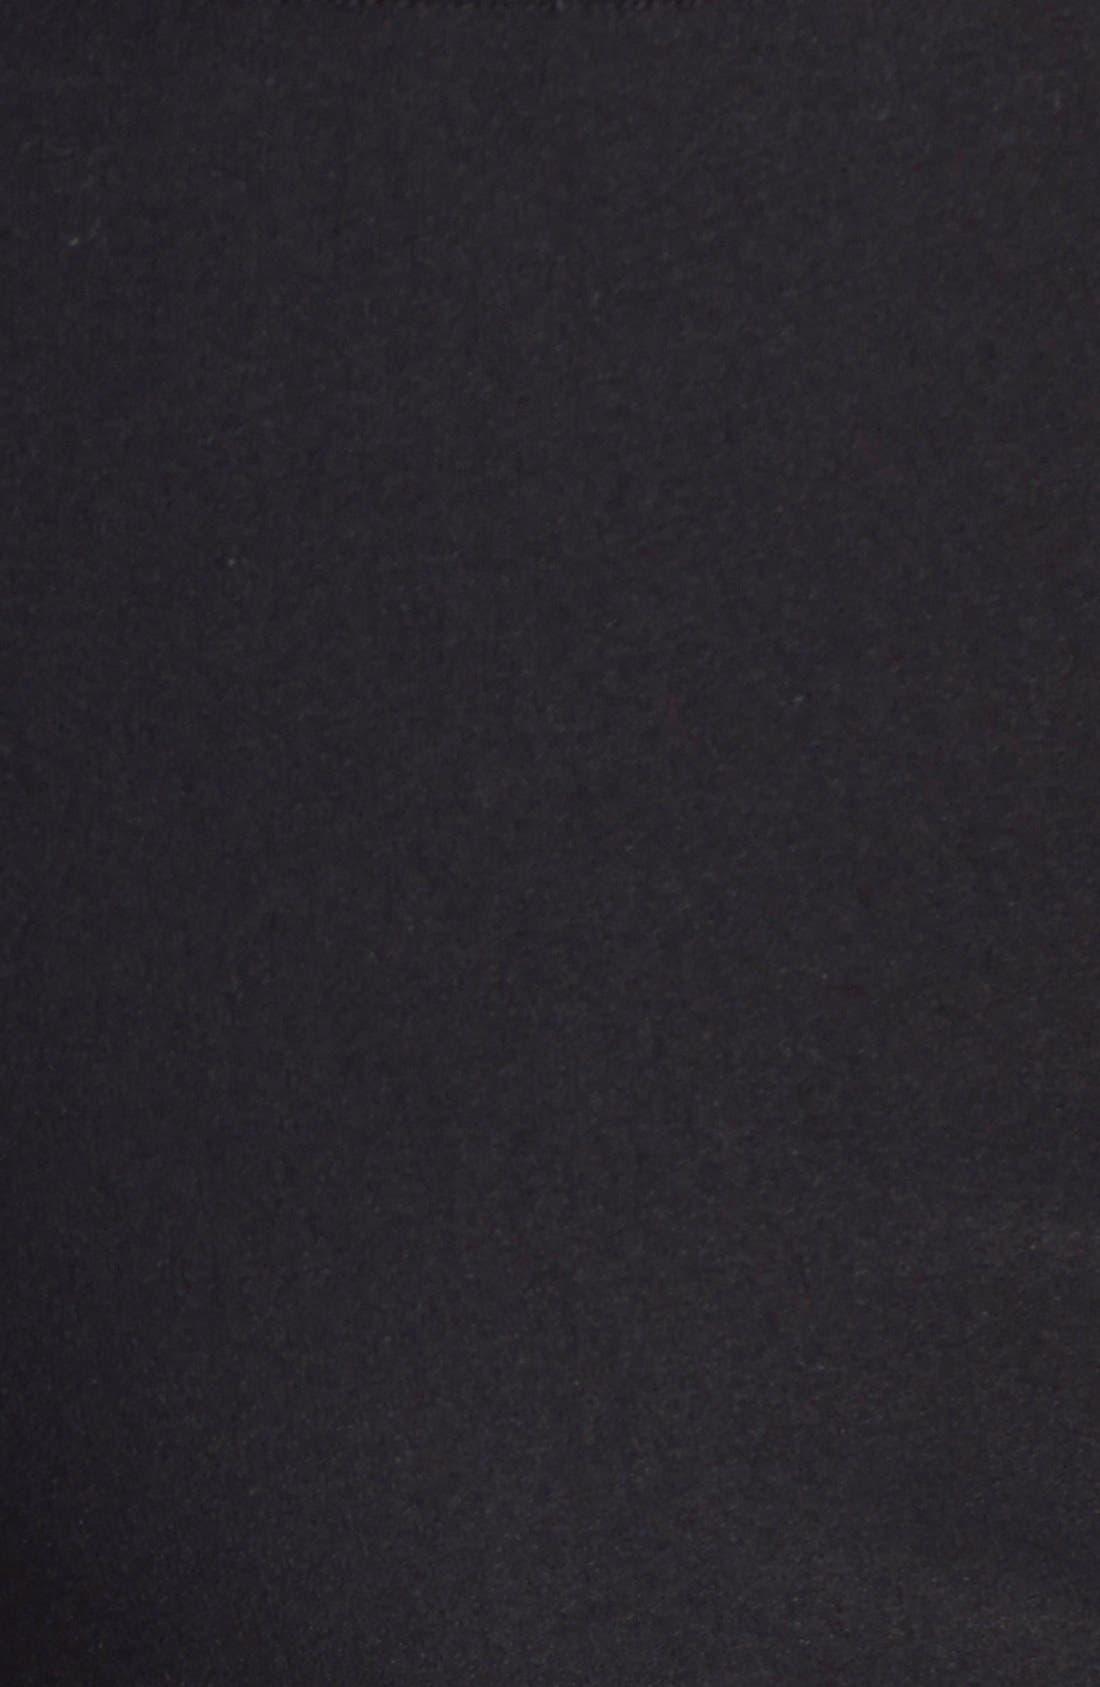 'Wonder Stretch' High Rise Straight Leg Pants,                             Alternate thumbnail 3, color,                             BLACK ONYX